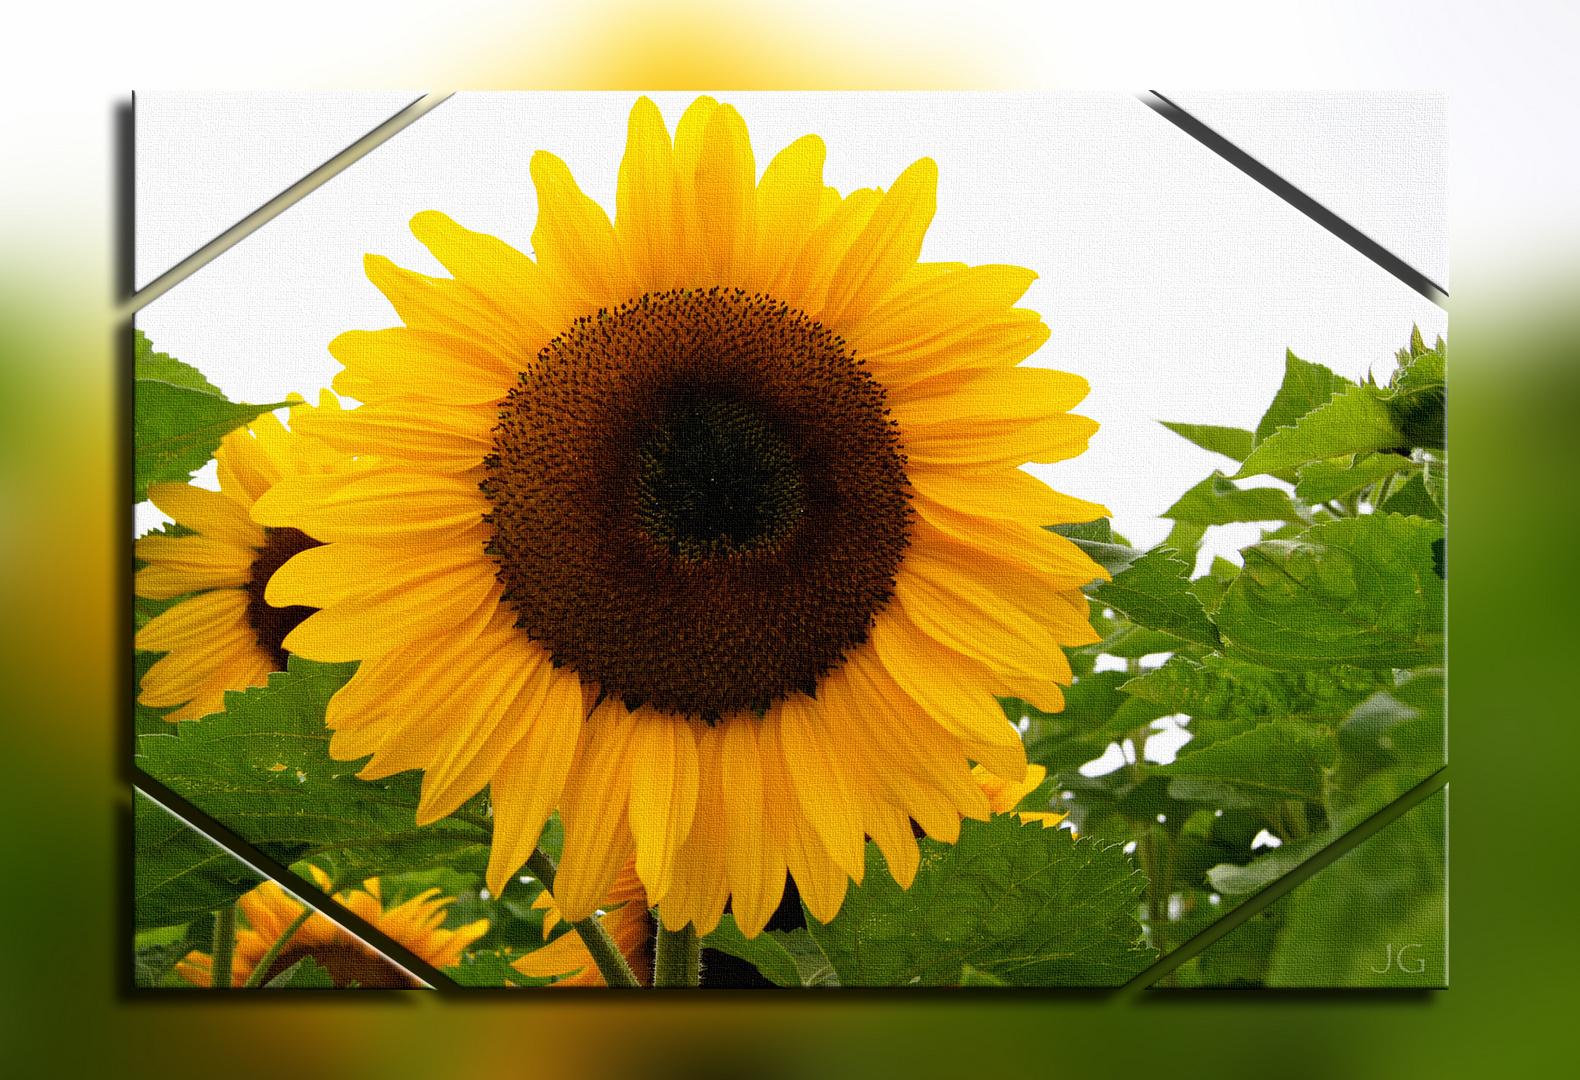 Sonnenblume auf Leinwand